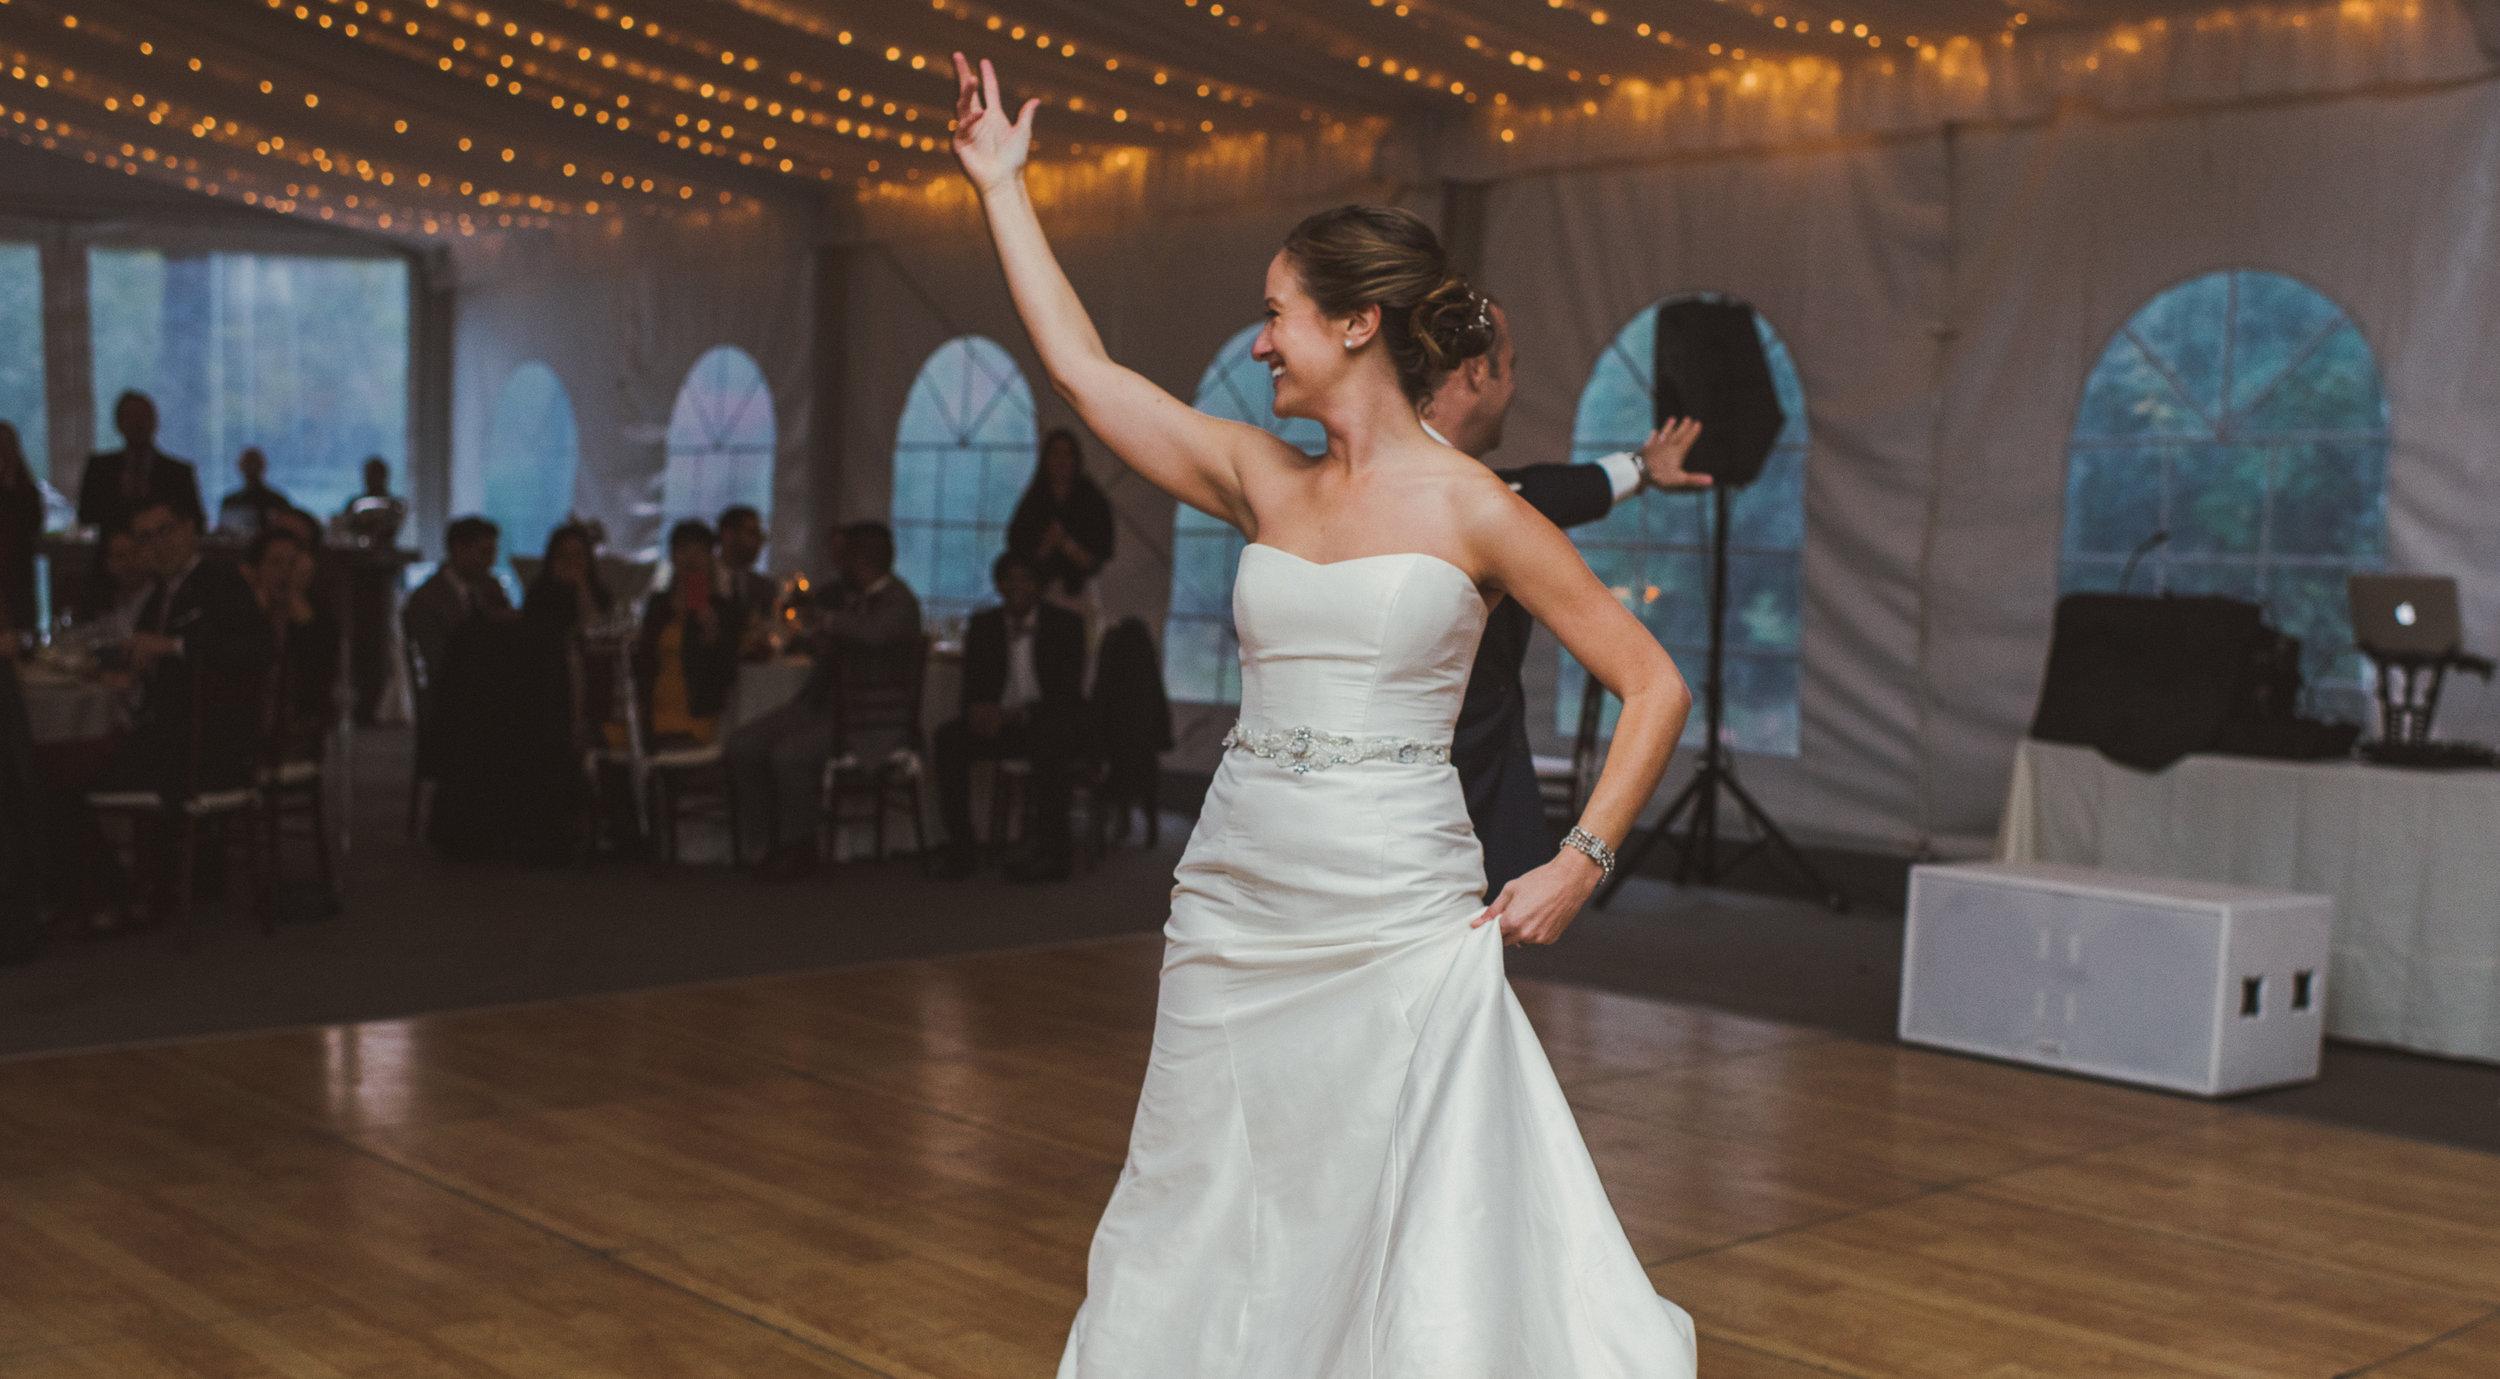 JACQUELINE & ANDREW WARSHAWER -BROOKMILL FARM FALL WEDDING - INTIMATE WEDDING PHOTOGRAPHER - TWOTWENTY by CHI-CHI AGBIM-483.jpg